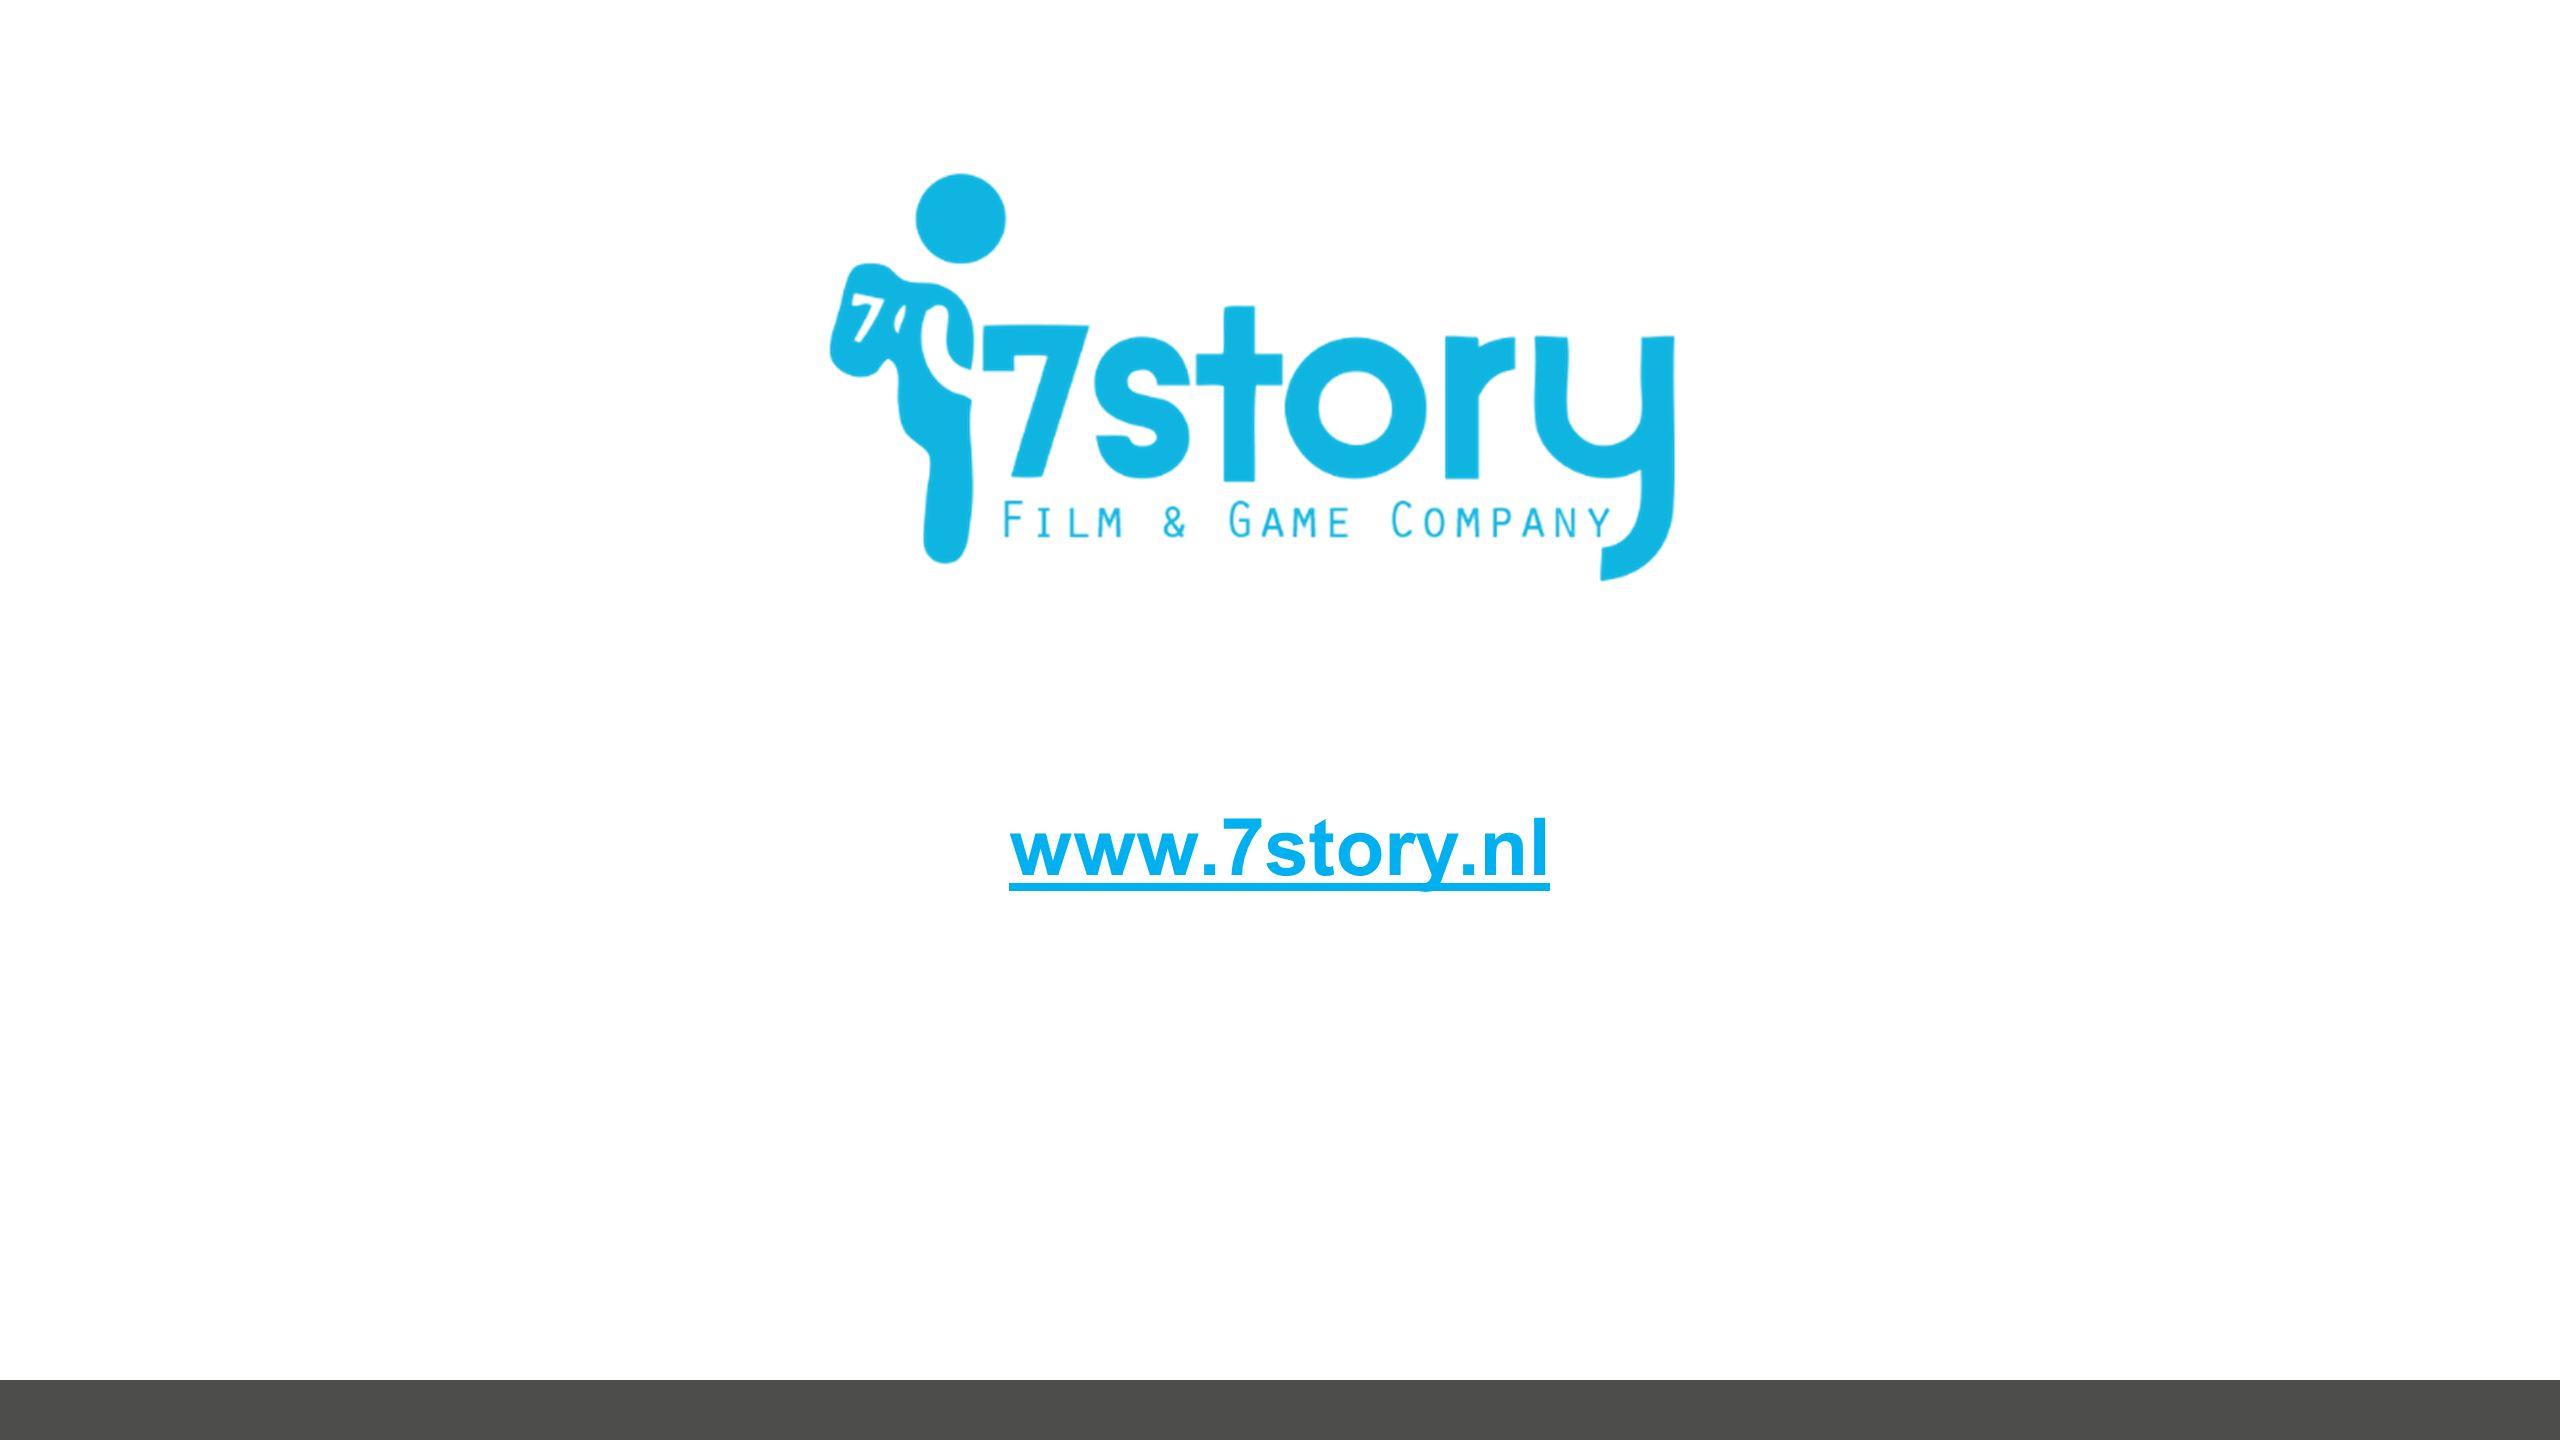 www.7story.nl